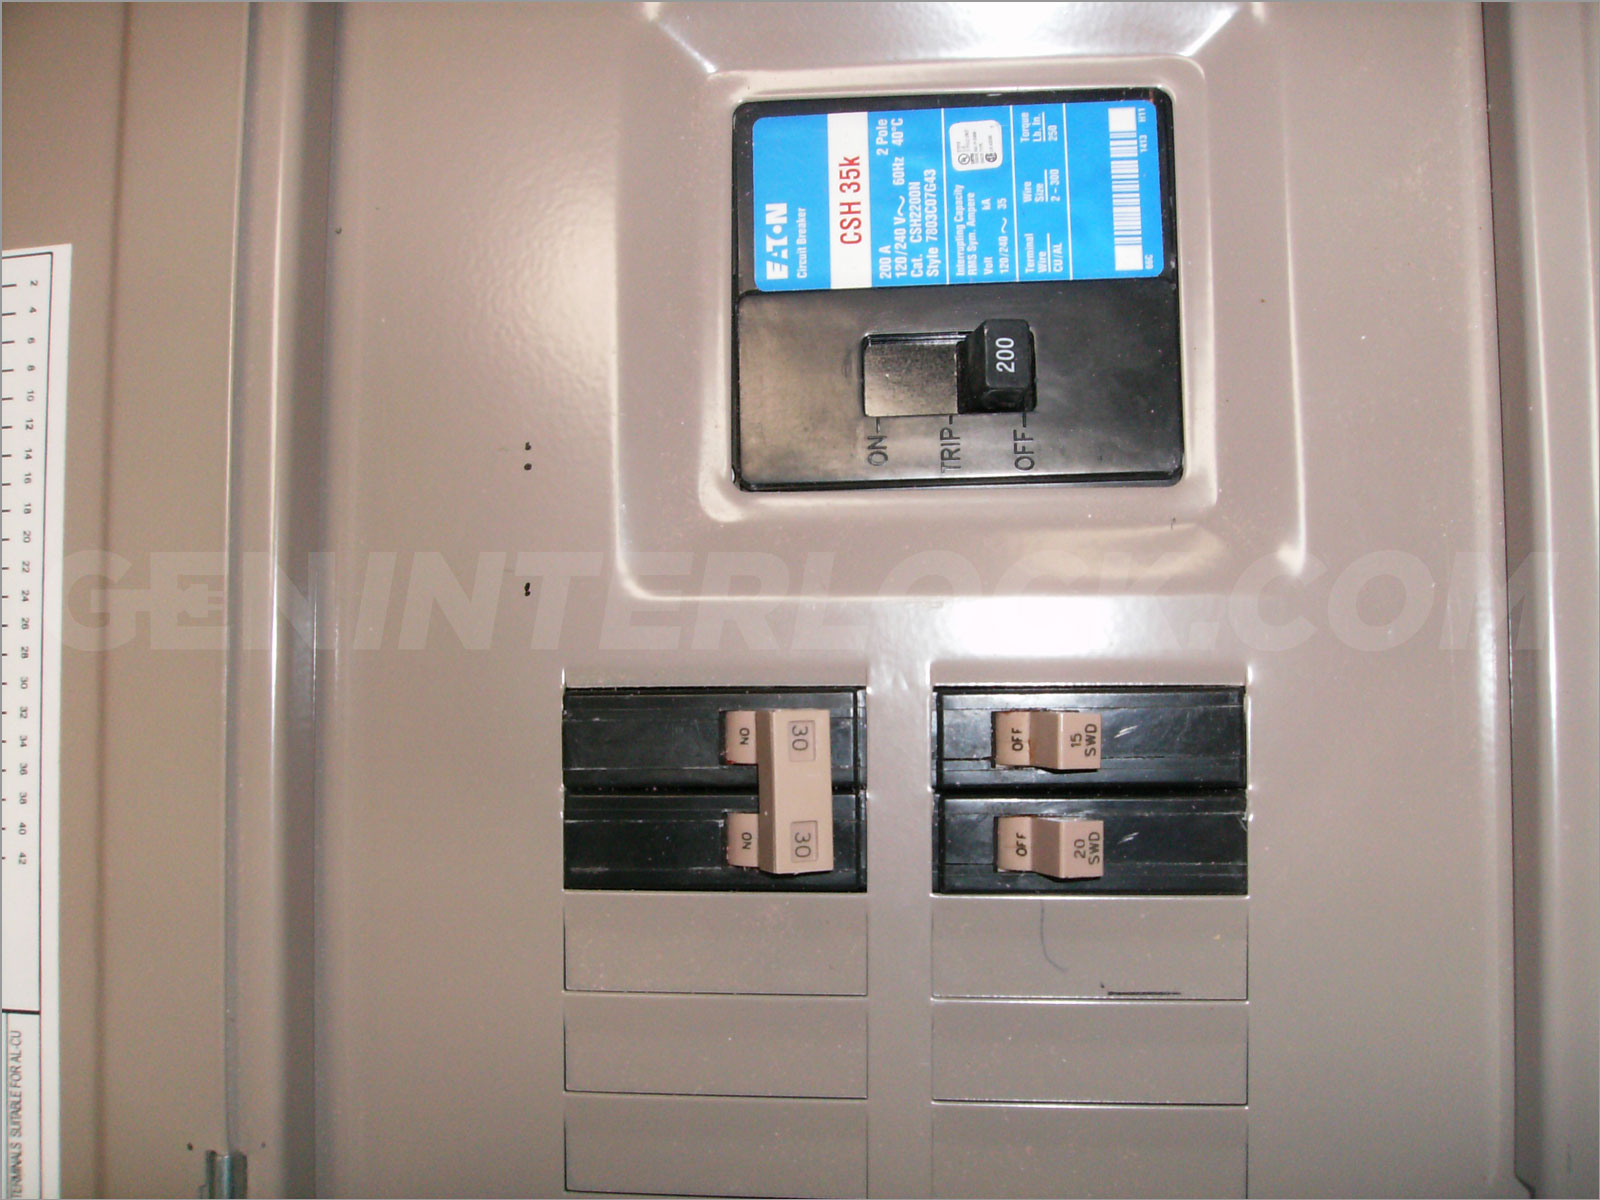 100 Amp Load Center Wiring Diagram Generator Interlock Kit Eaton Cutler Hammer 150 And 200